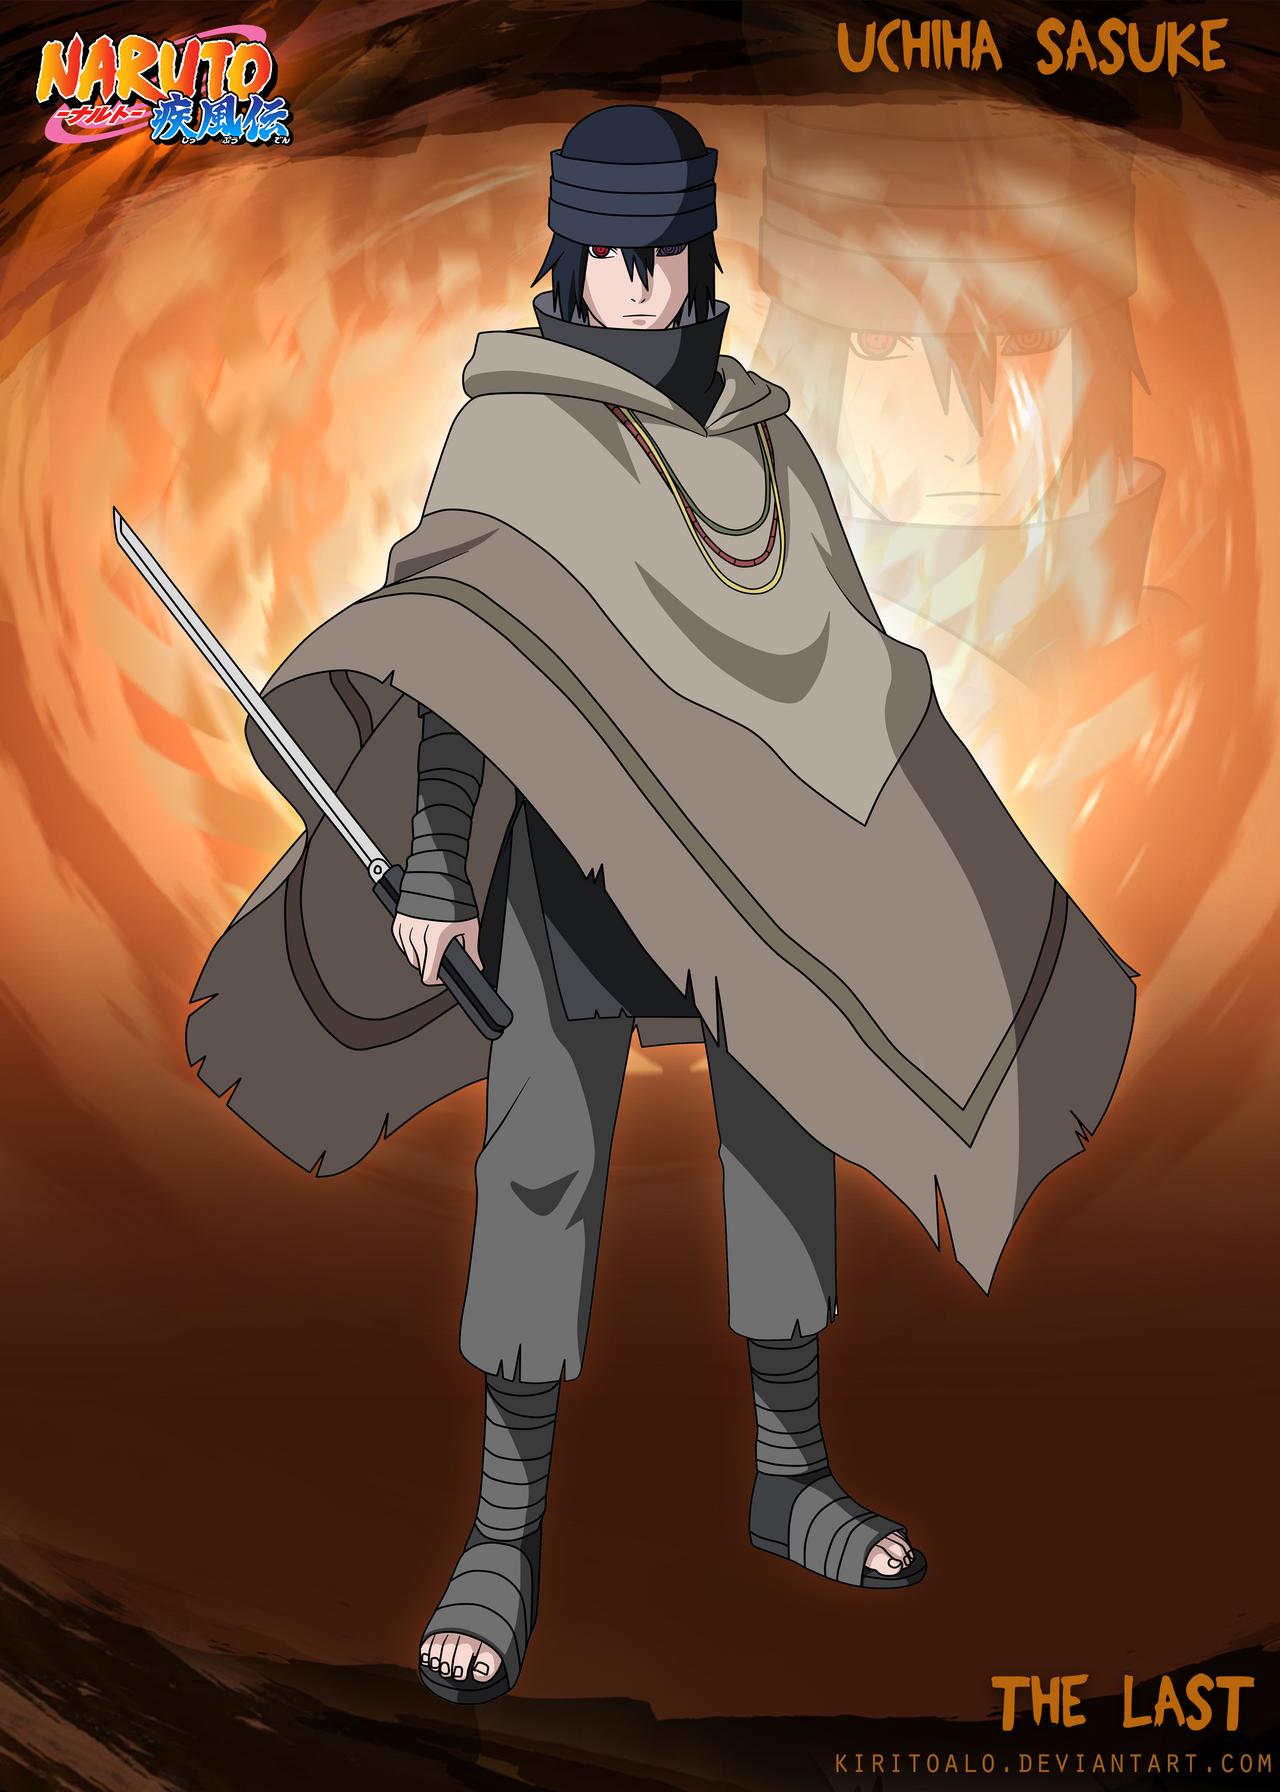 Sasuke Uchiha - The last by Shizurou on DeviantArt